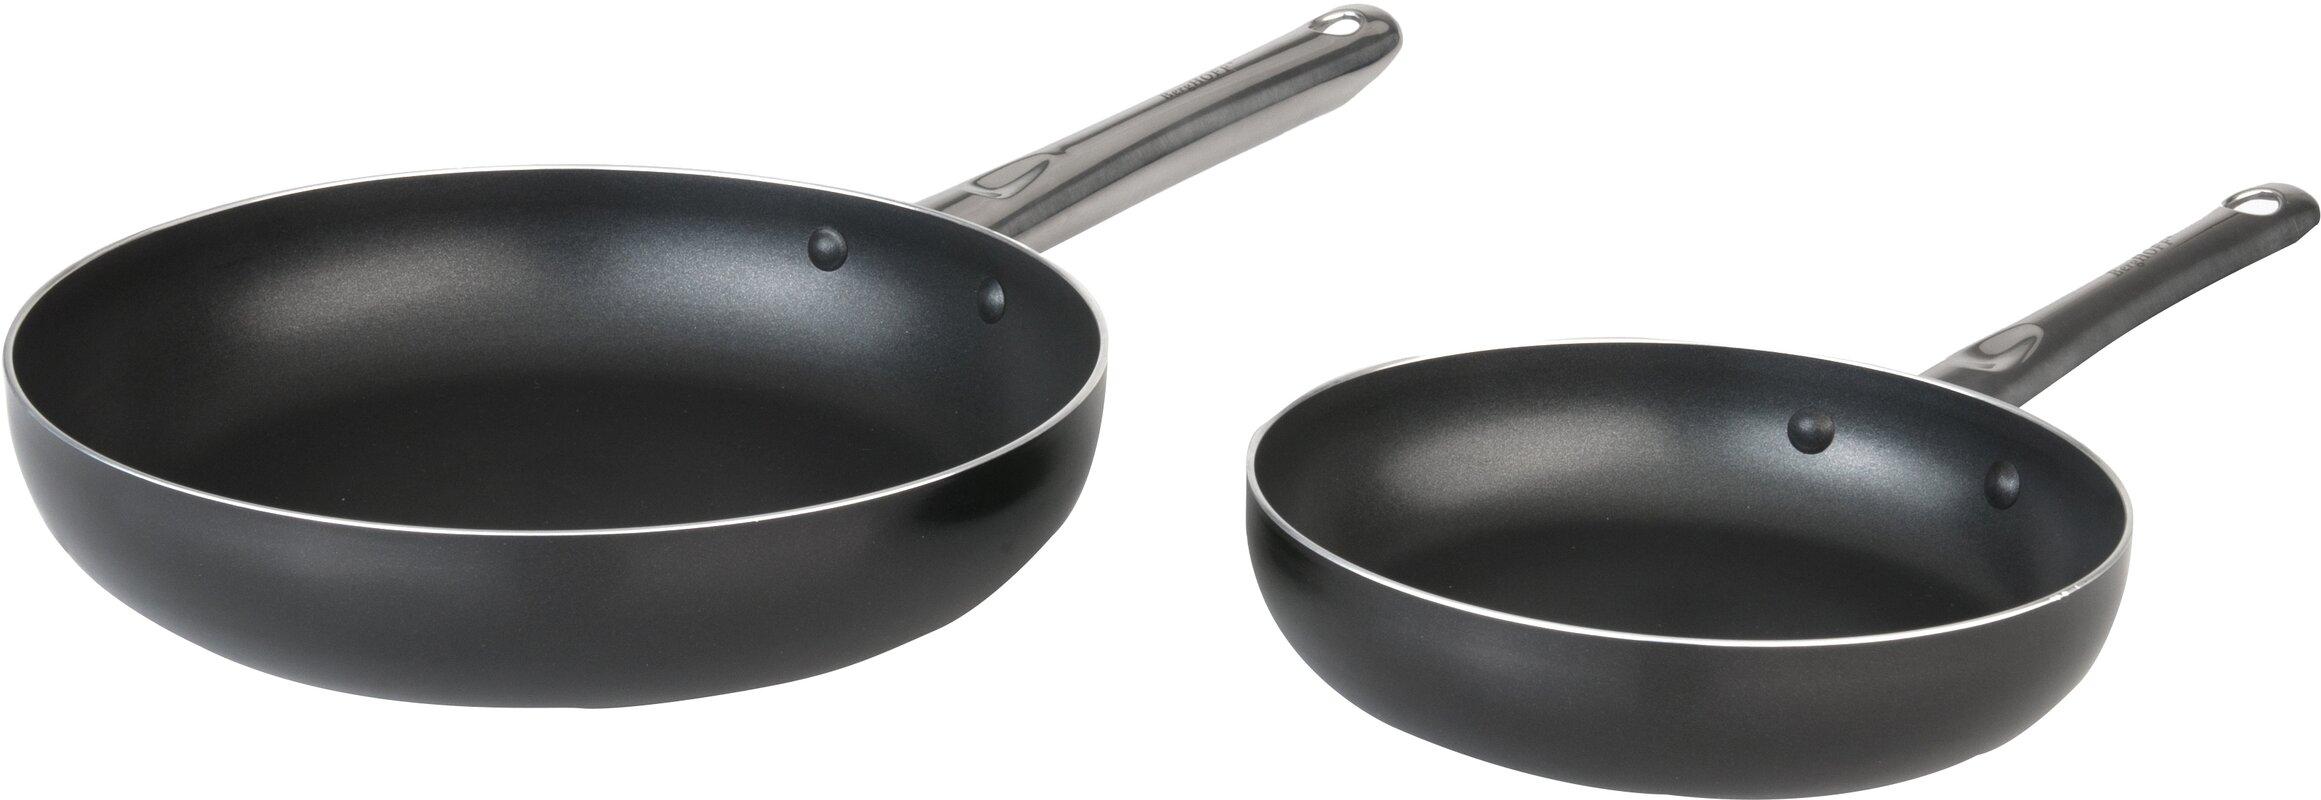 Boreal 2-Piece Non-Stick Frying Pan Set